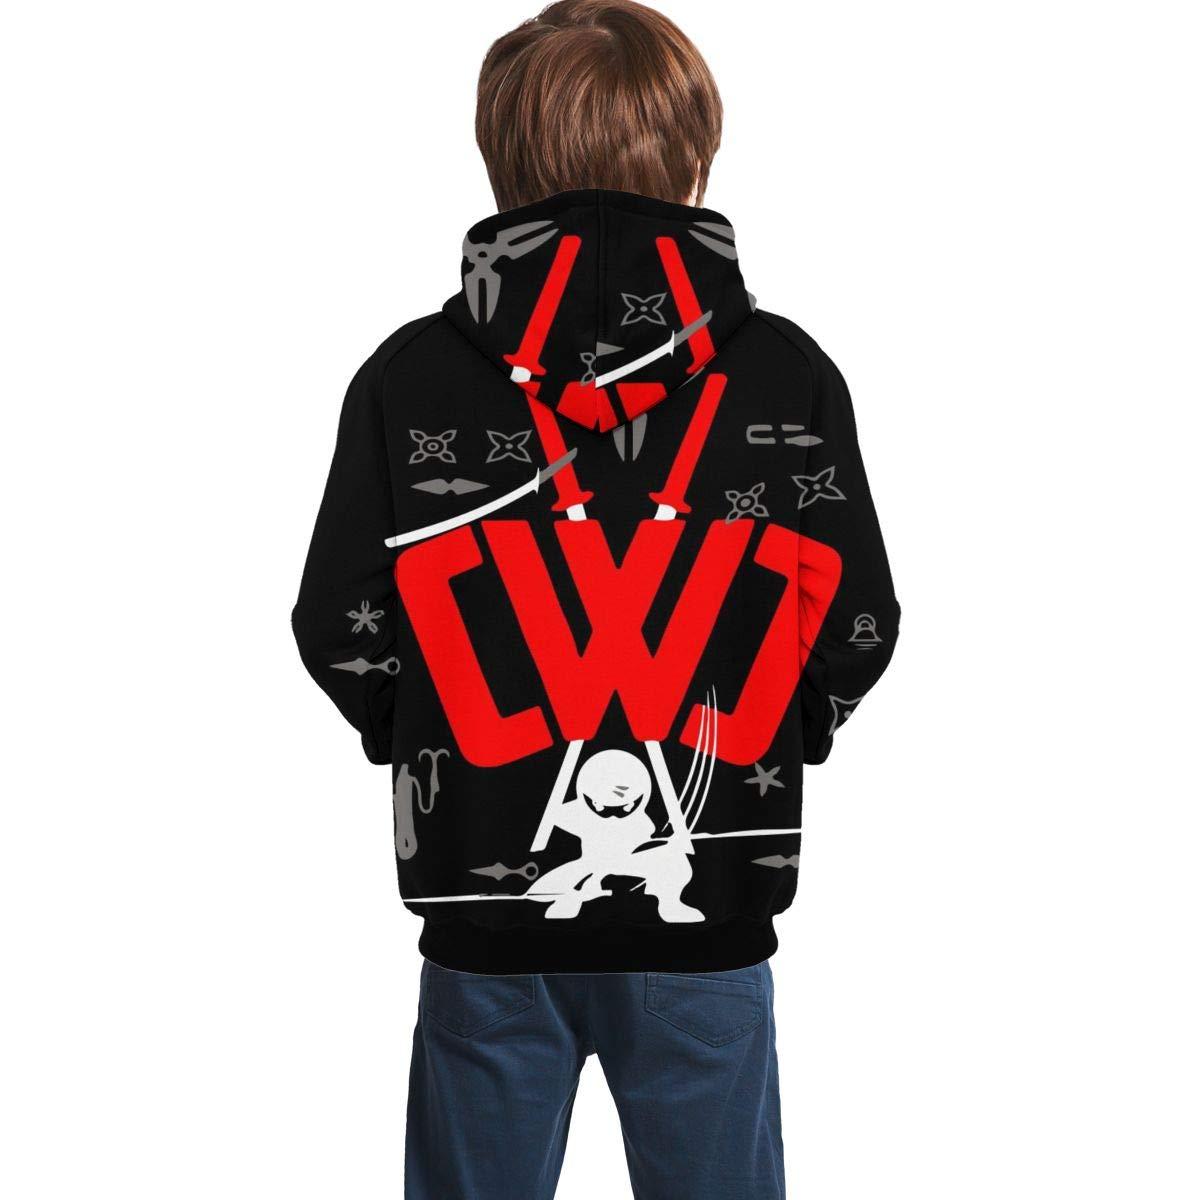 Joancoo Chad Wild Clay Ninja Darts Graphic Pullover Hoodie for Teens Boys Girls